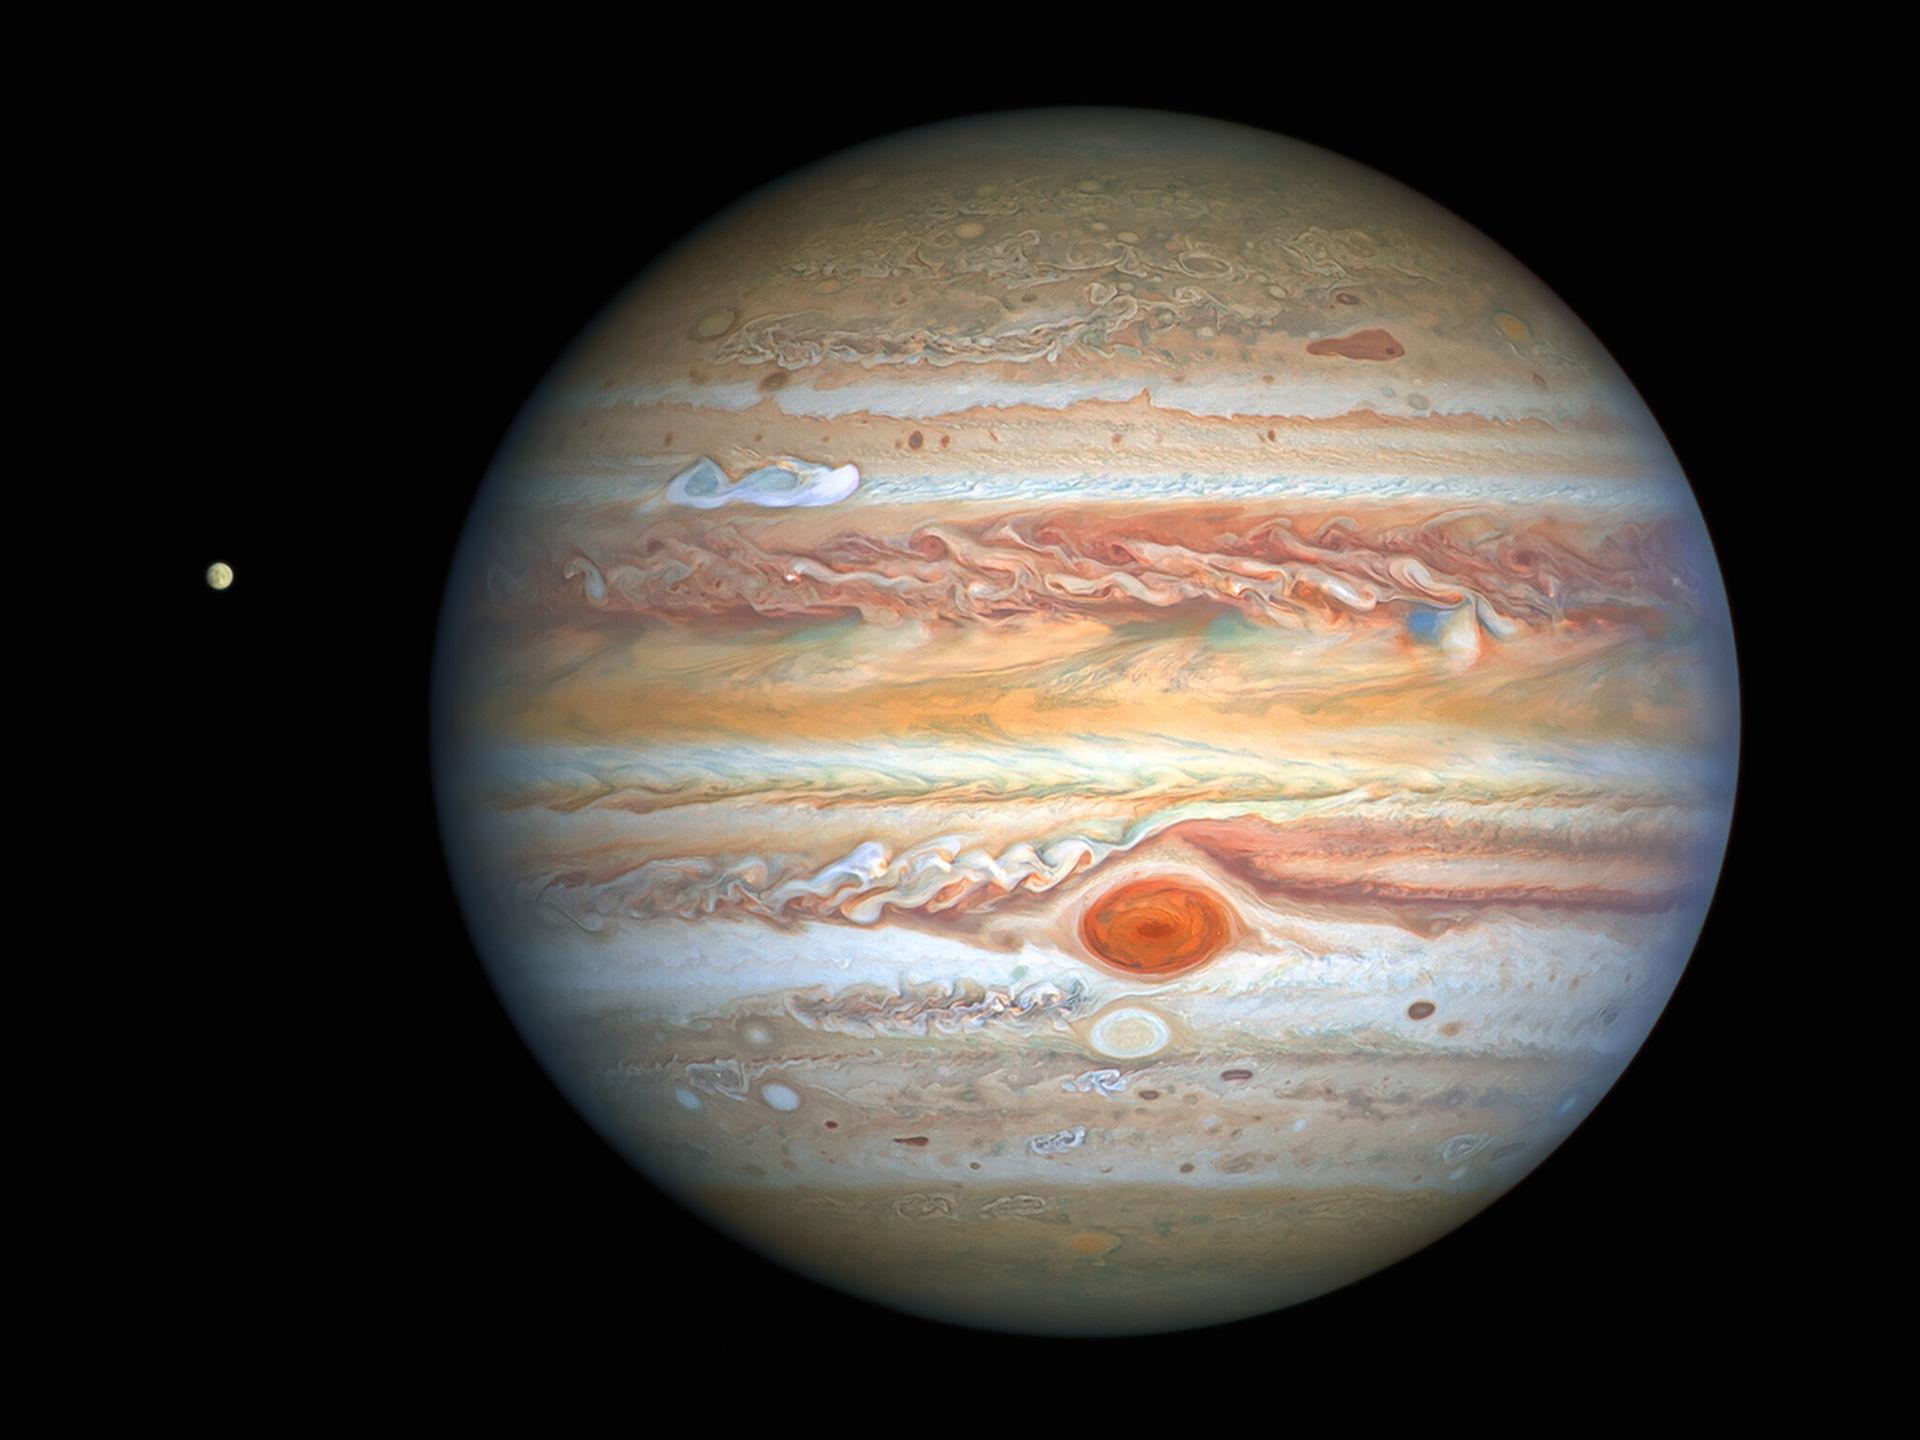 Hubble fotar nya bilder på Jupiter